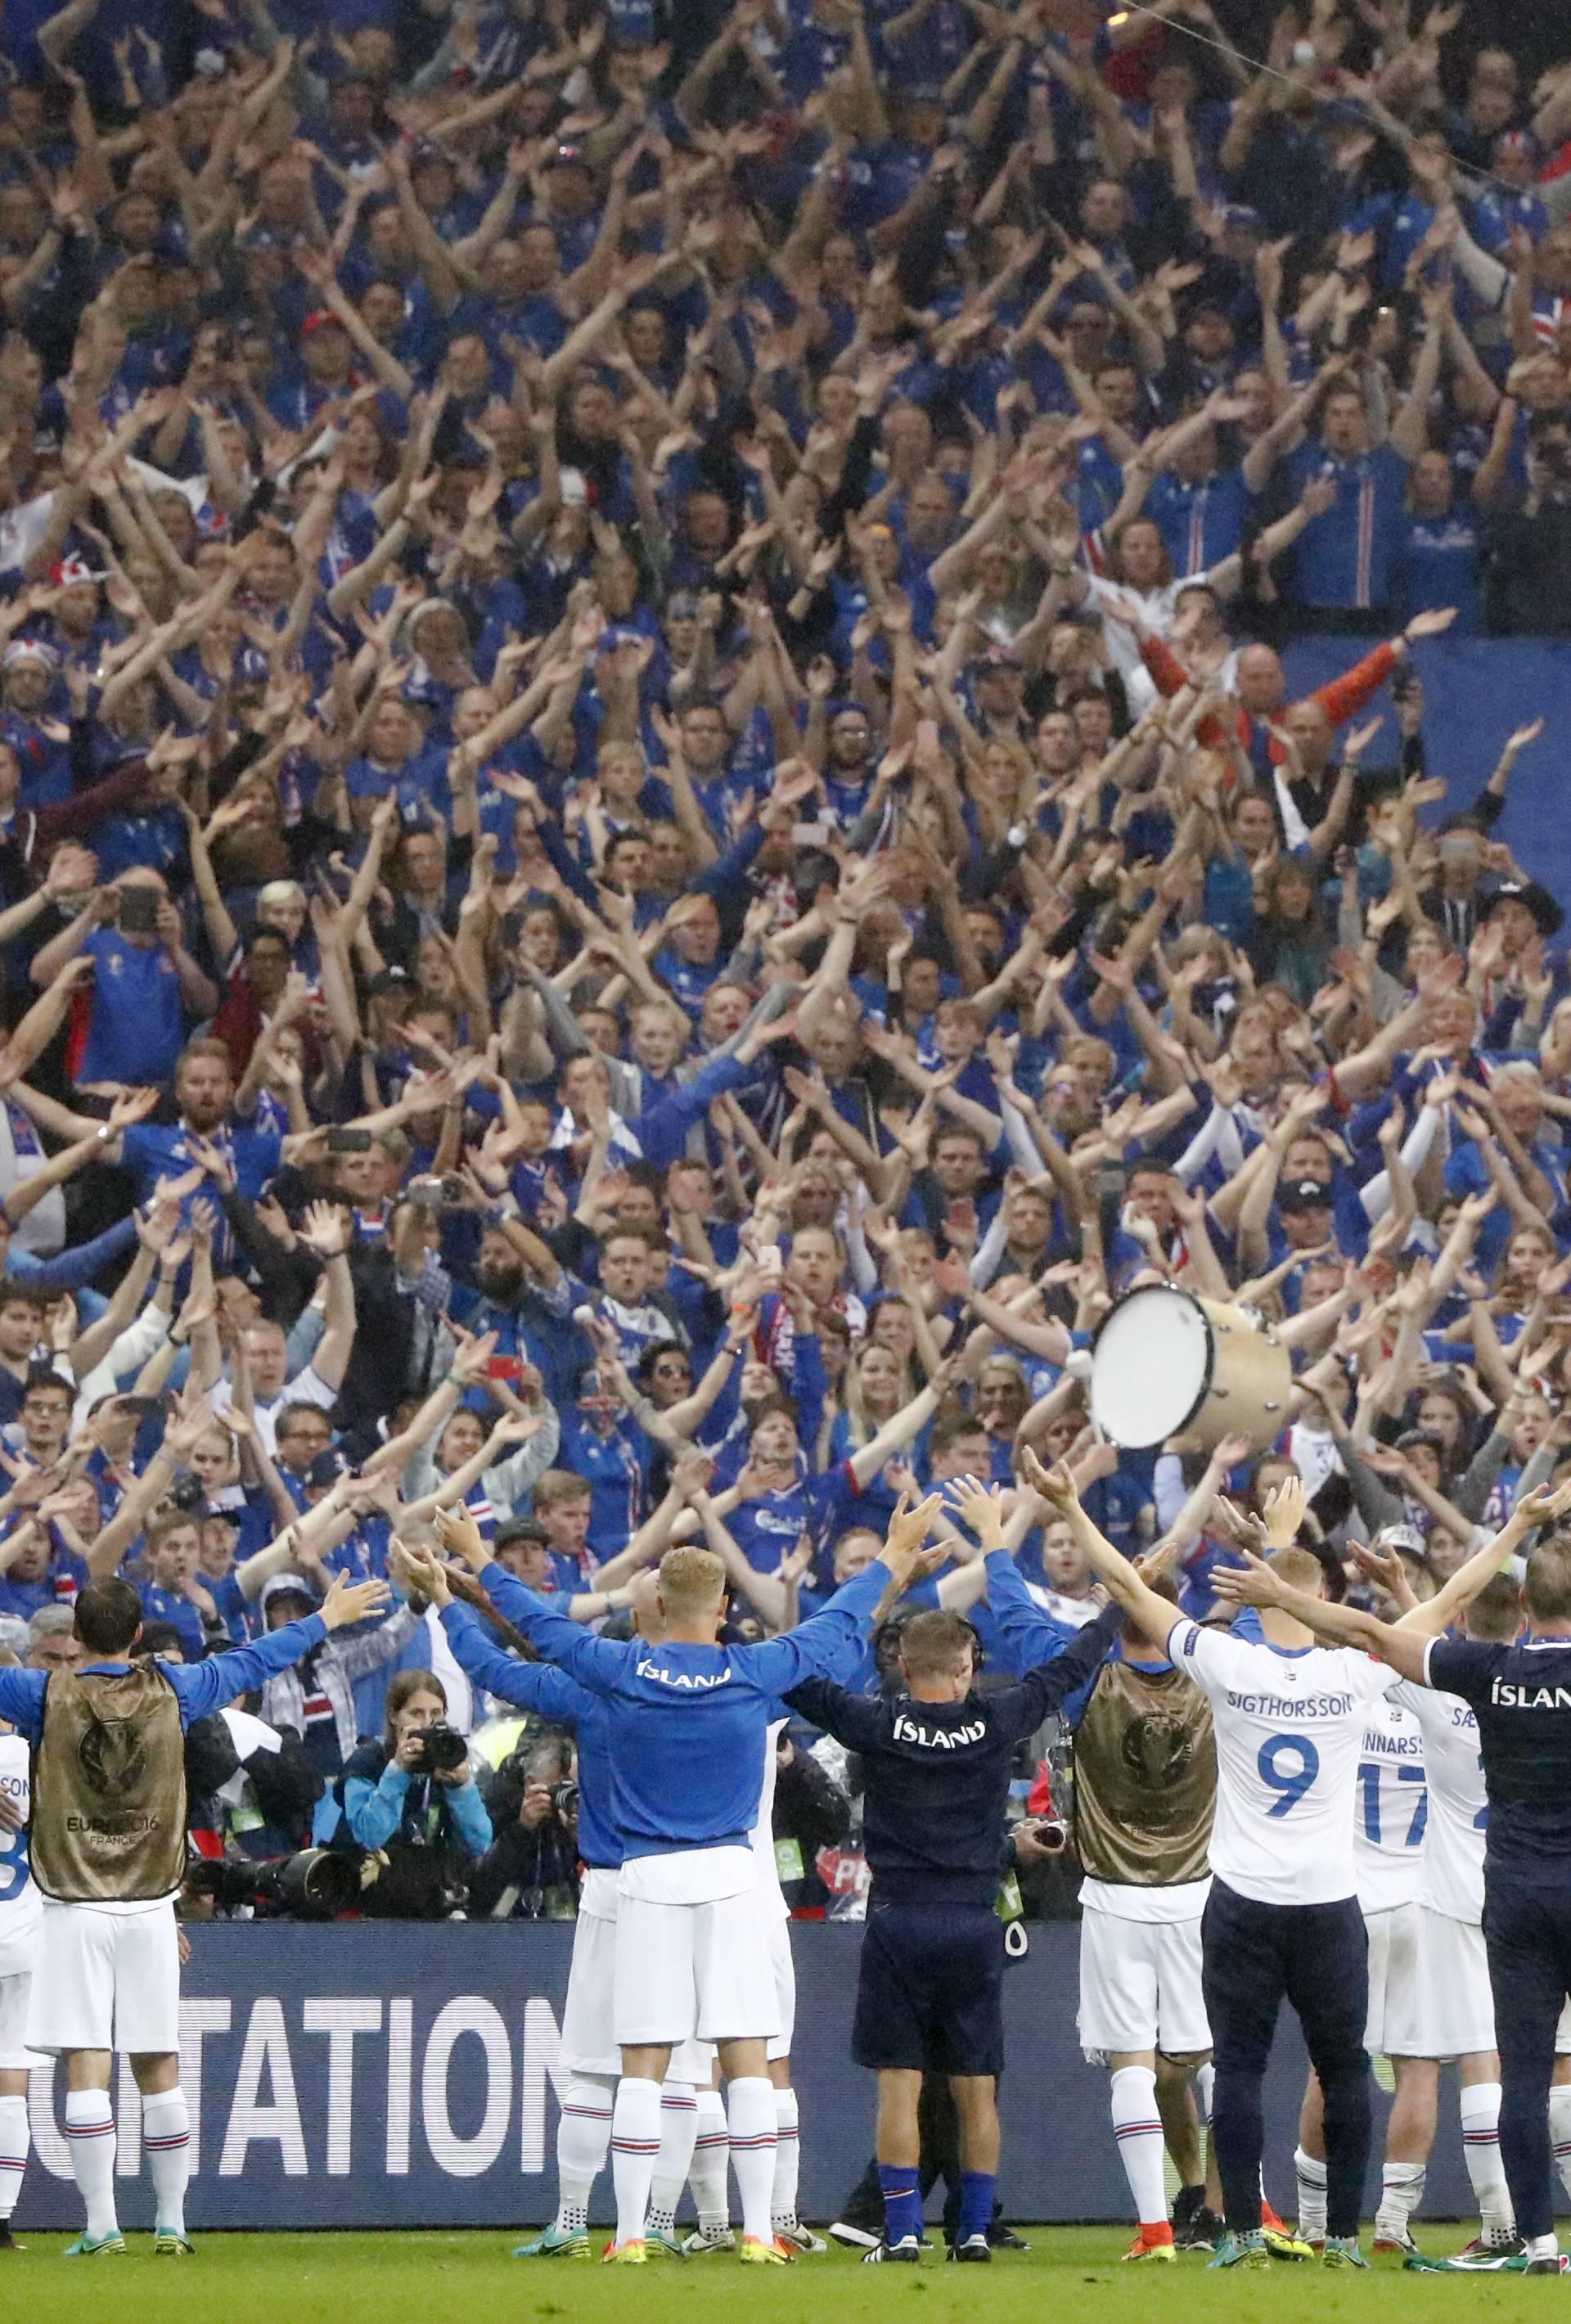 France v Iceland - EURO 2016 - Quarter Final